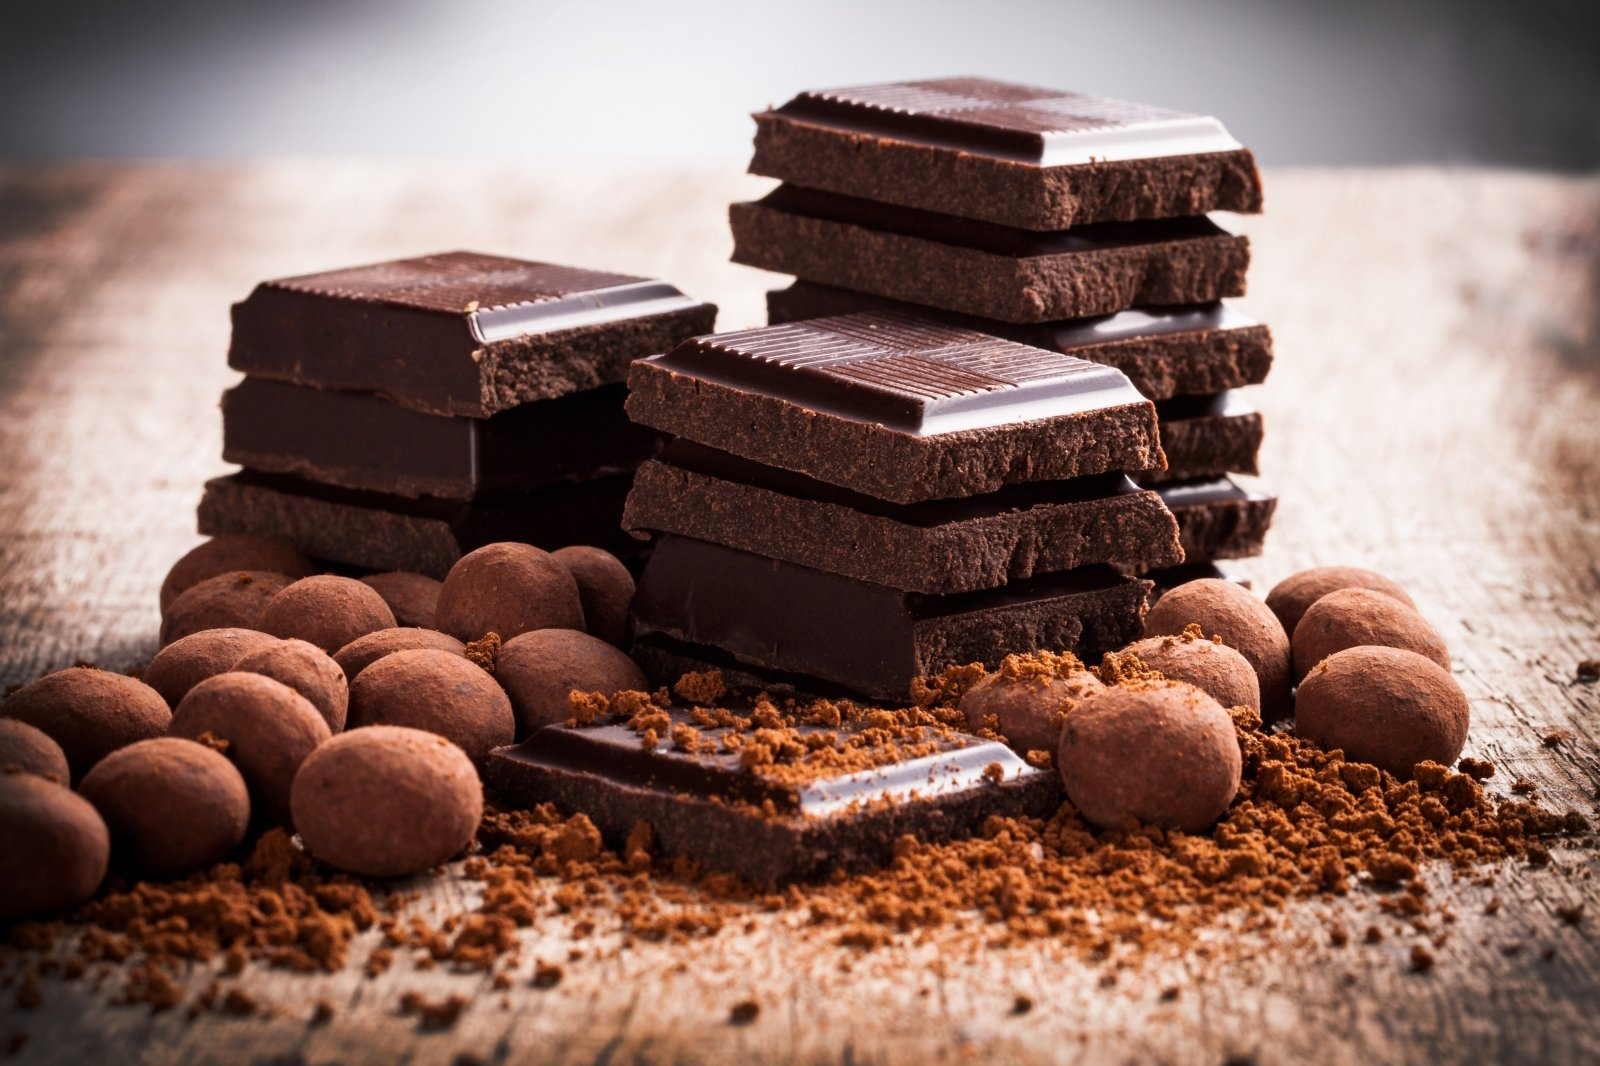 Šokoladas lieknėjantiems – priešas ar draugas?